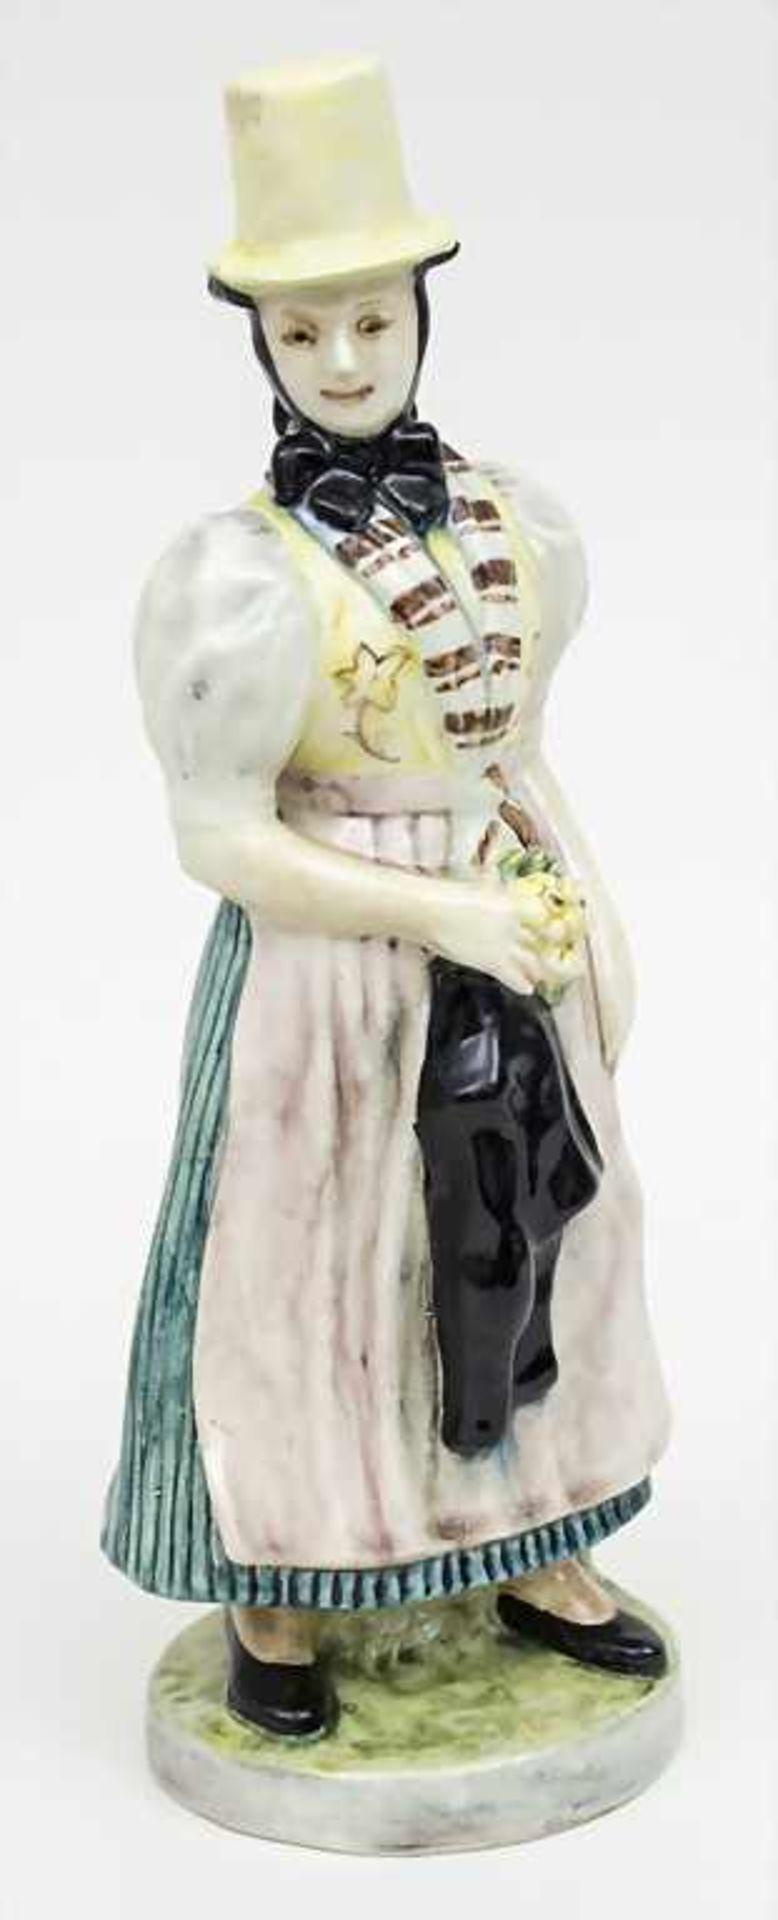 Trachtenfigur 'Tribergerin' / A costumed woman from Triberg, Karlsruher Majolika, um 1950 - Bild 2 aus 4